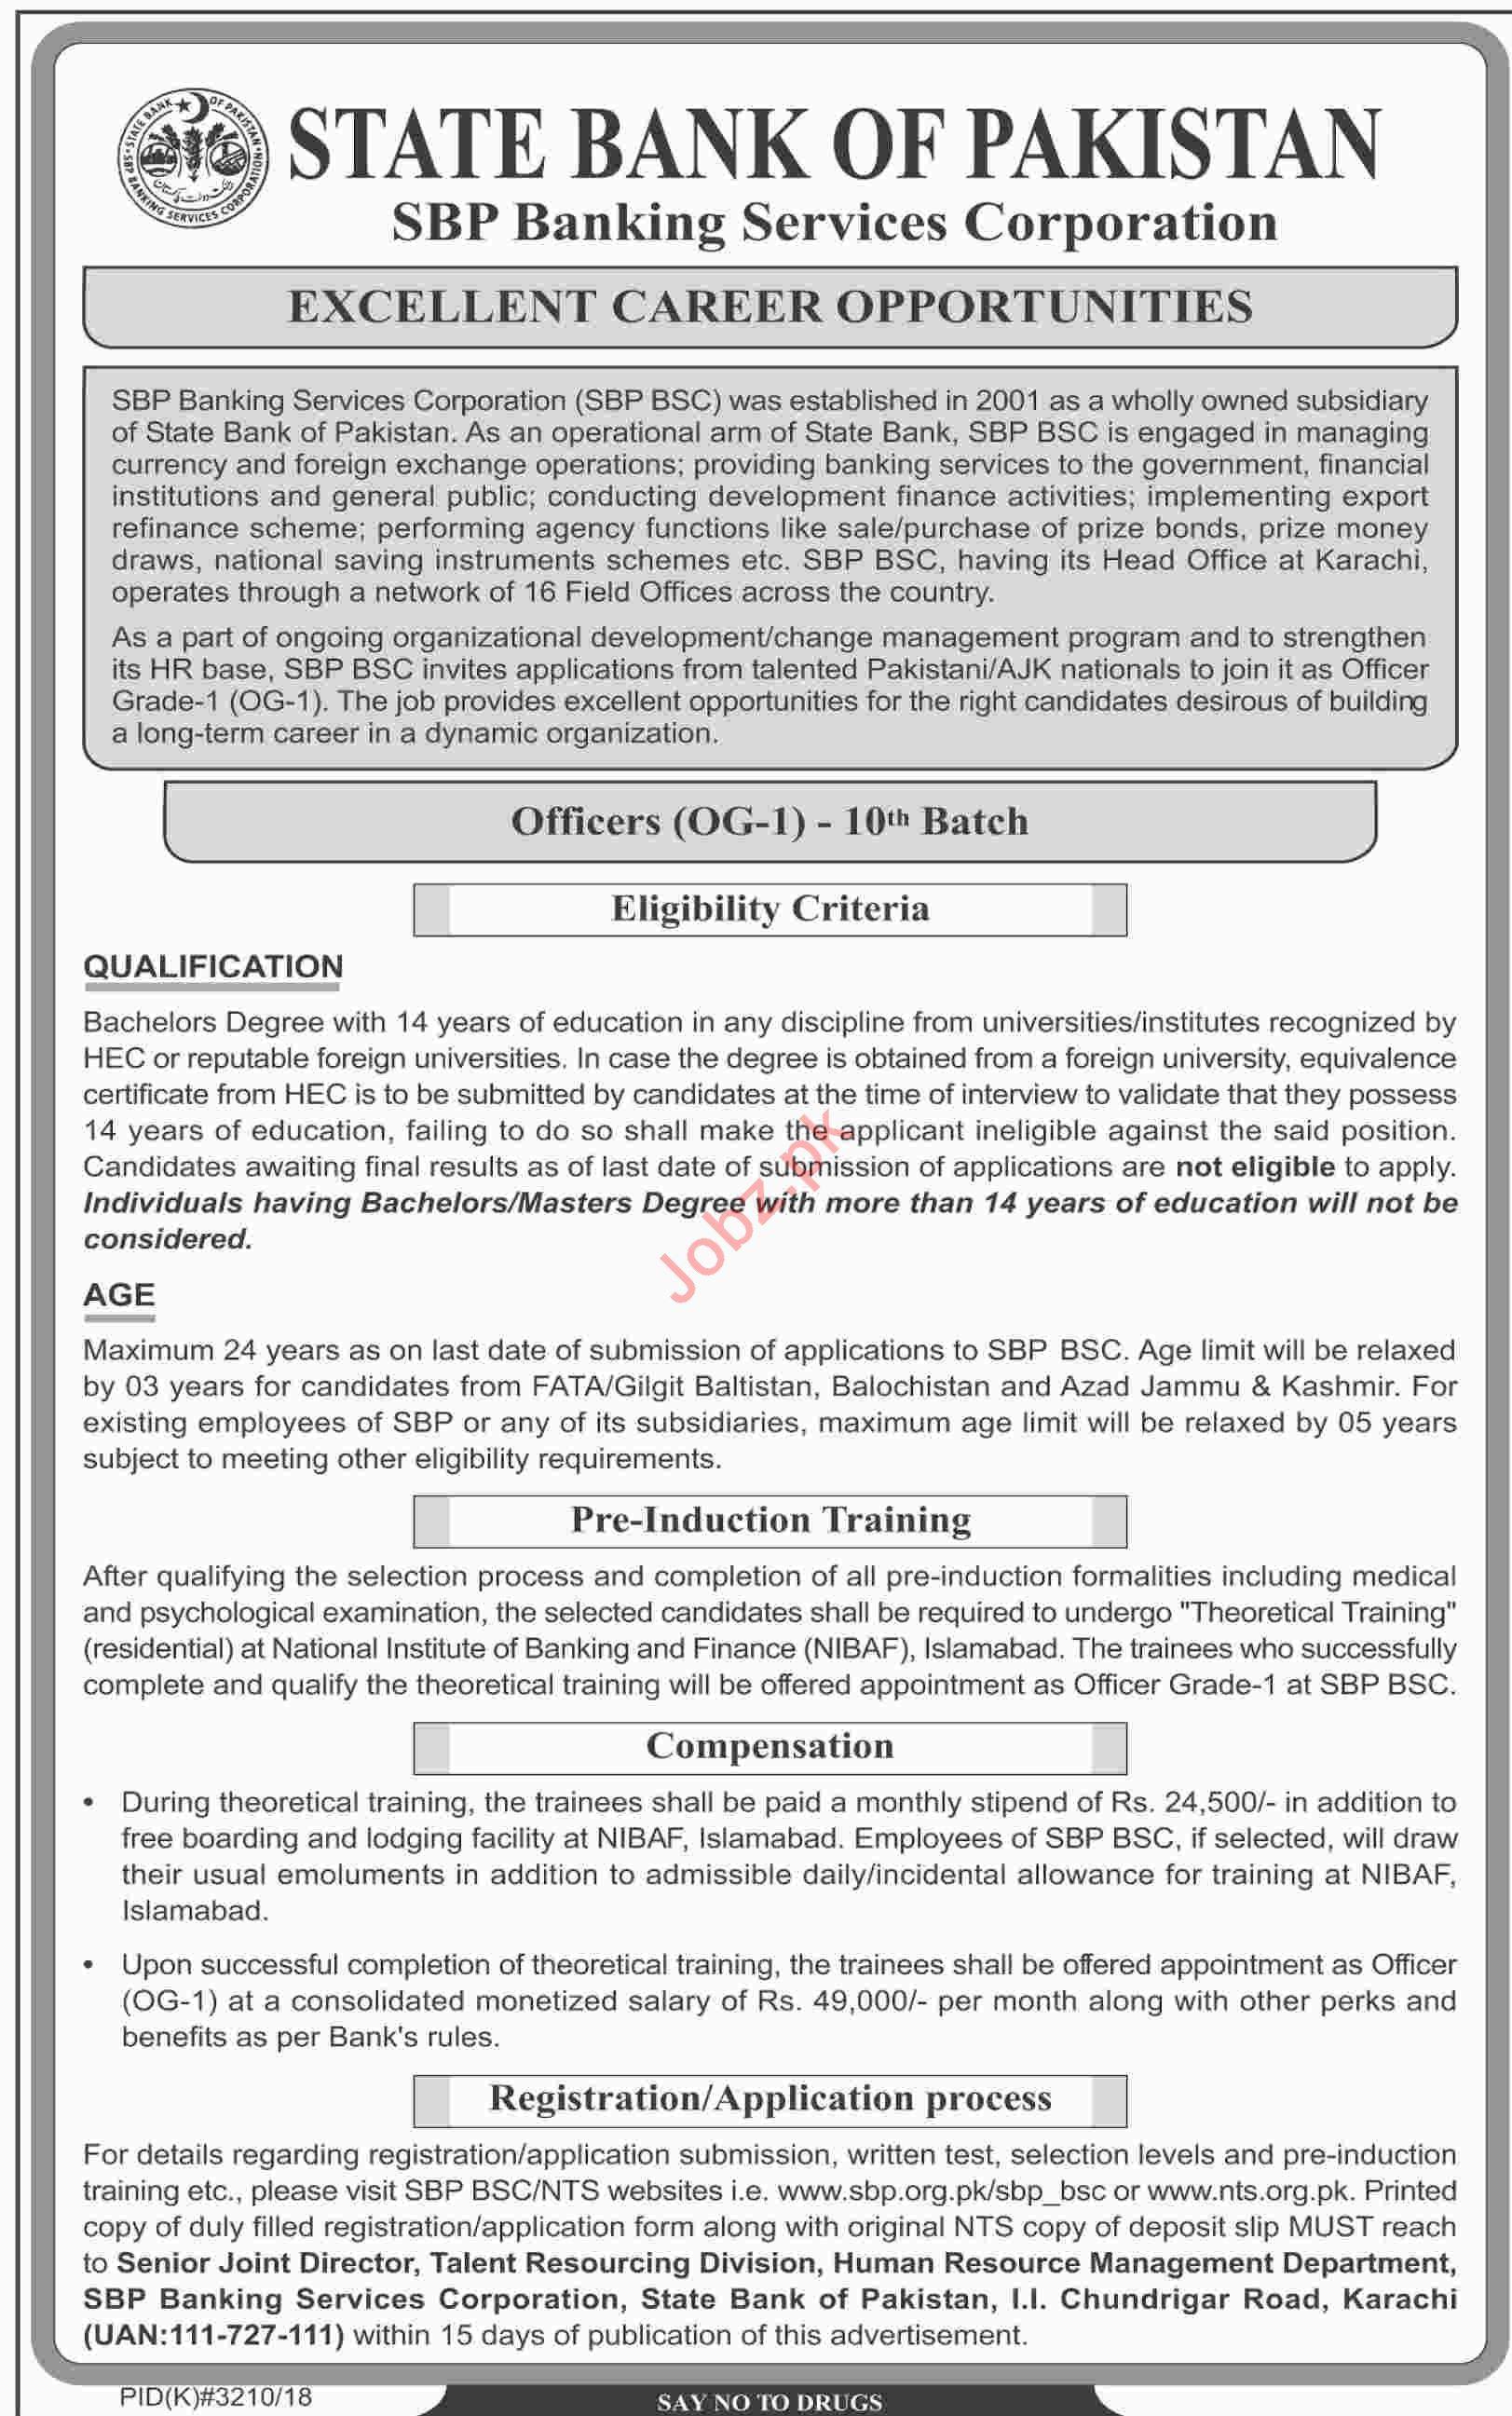 State Bank of Pakistan SBP Officer Jobs